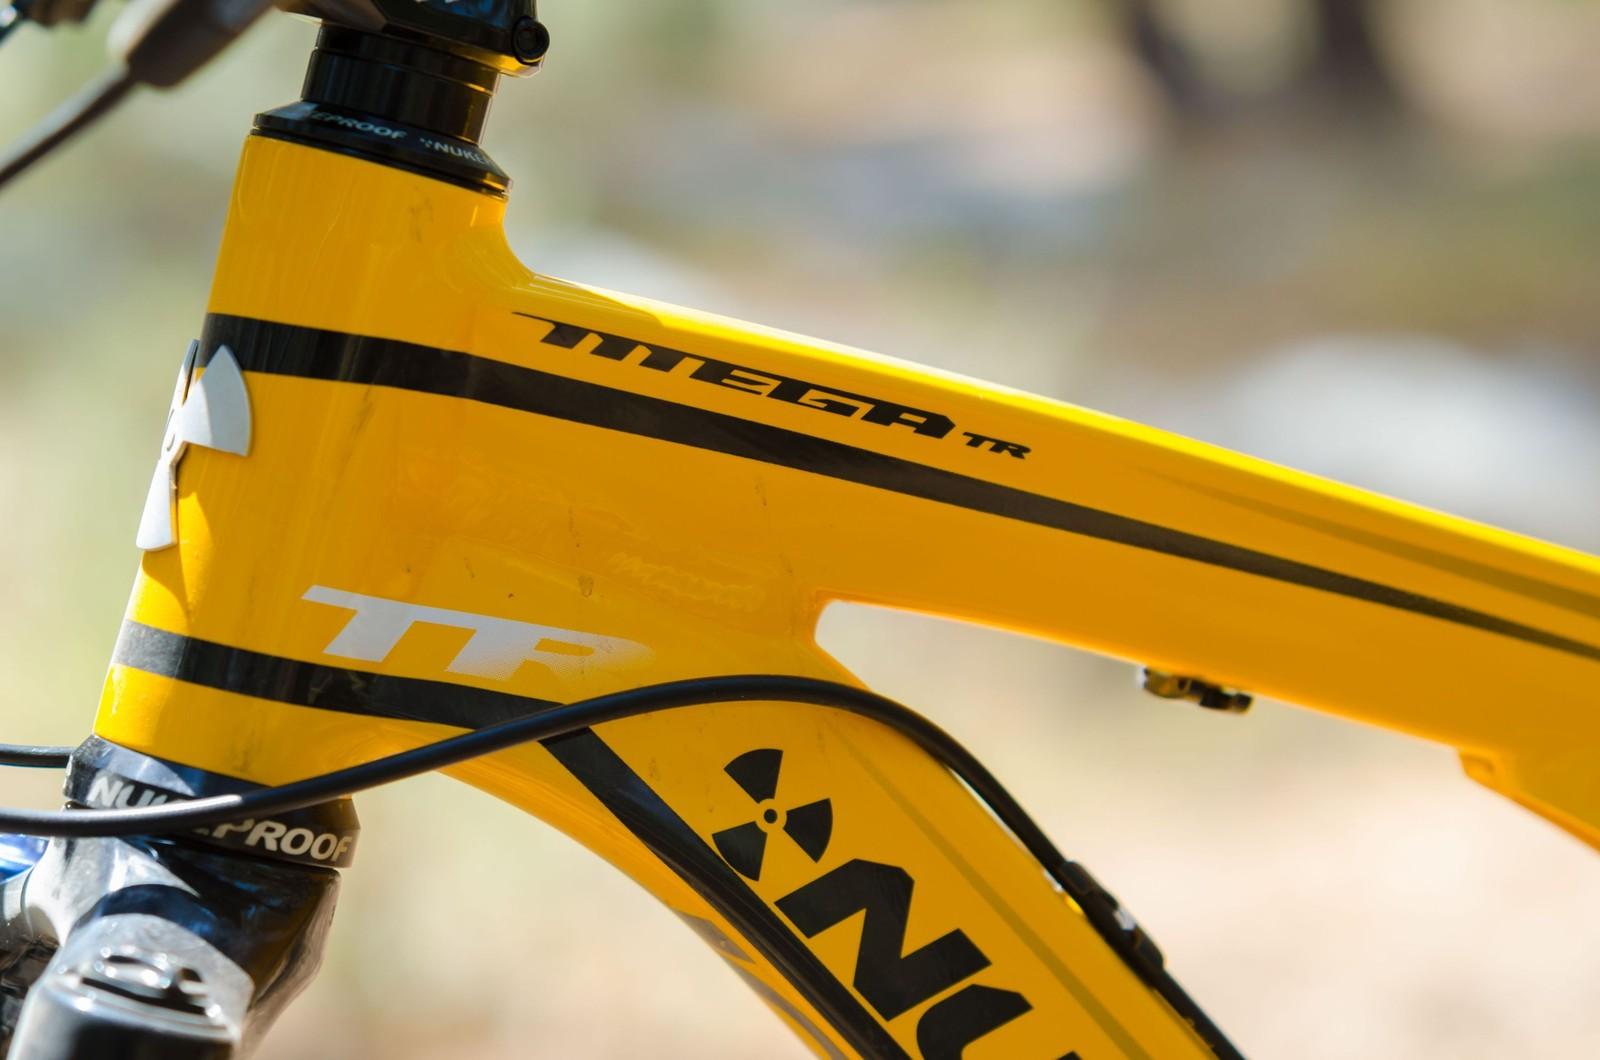 2013 Nukeproof Mega TR - Frame detail - iceman2058 - Mountain Biking Pictures - Vital MTB